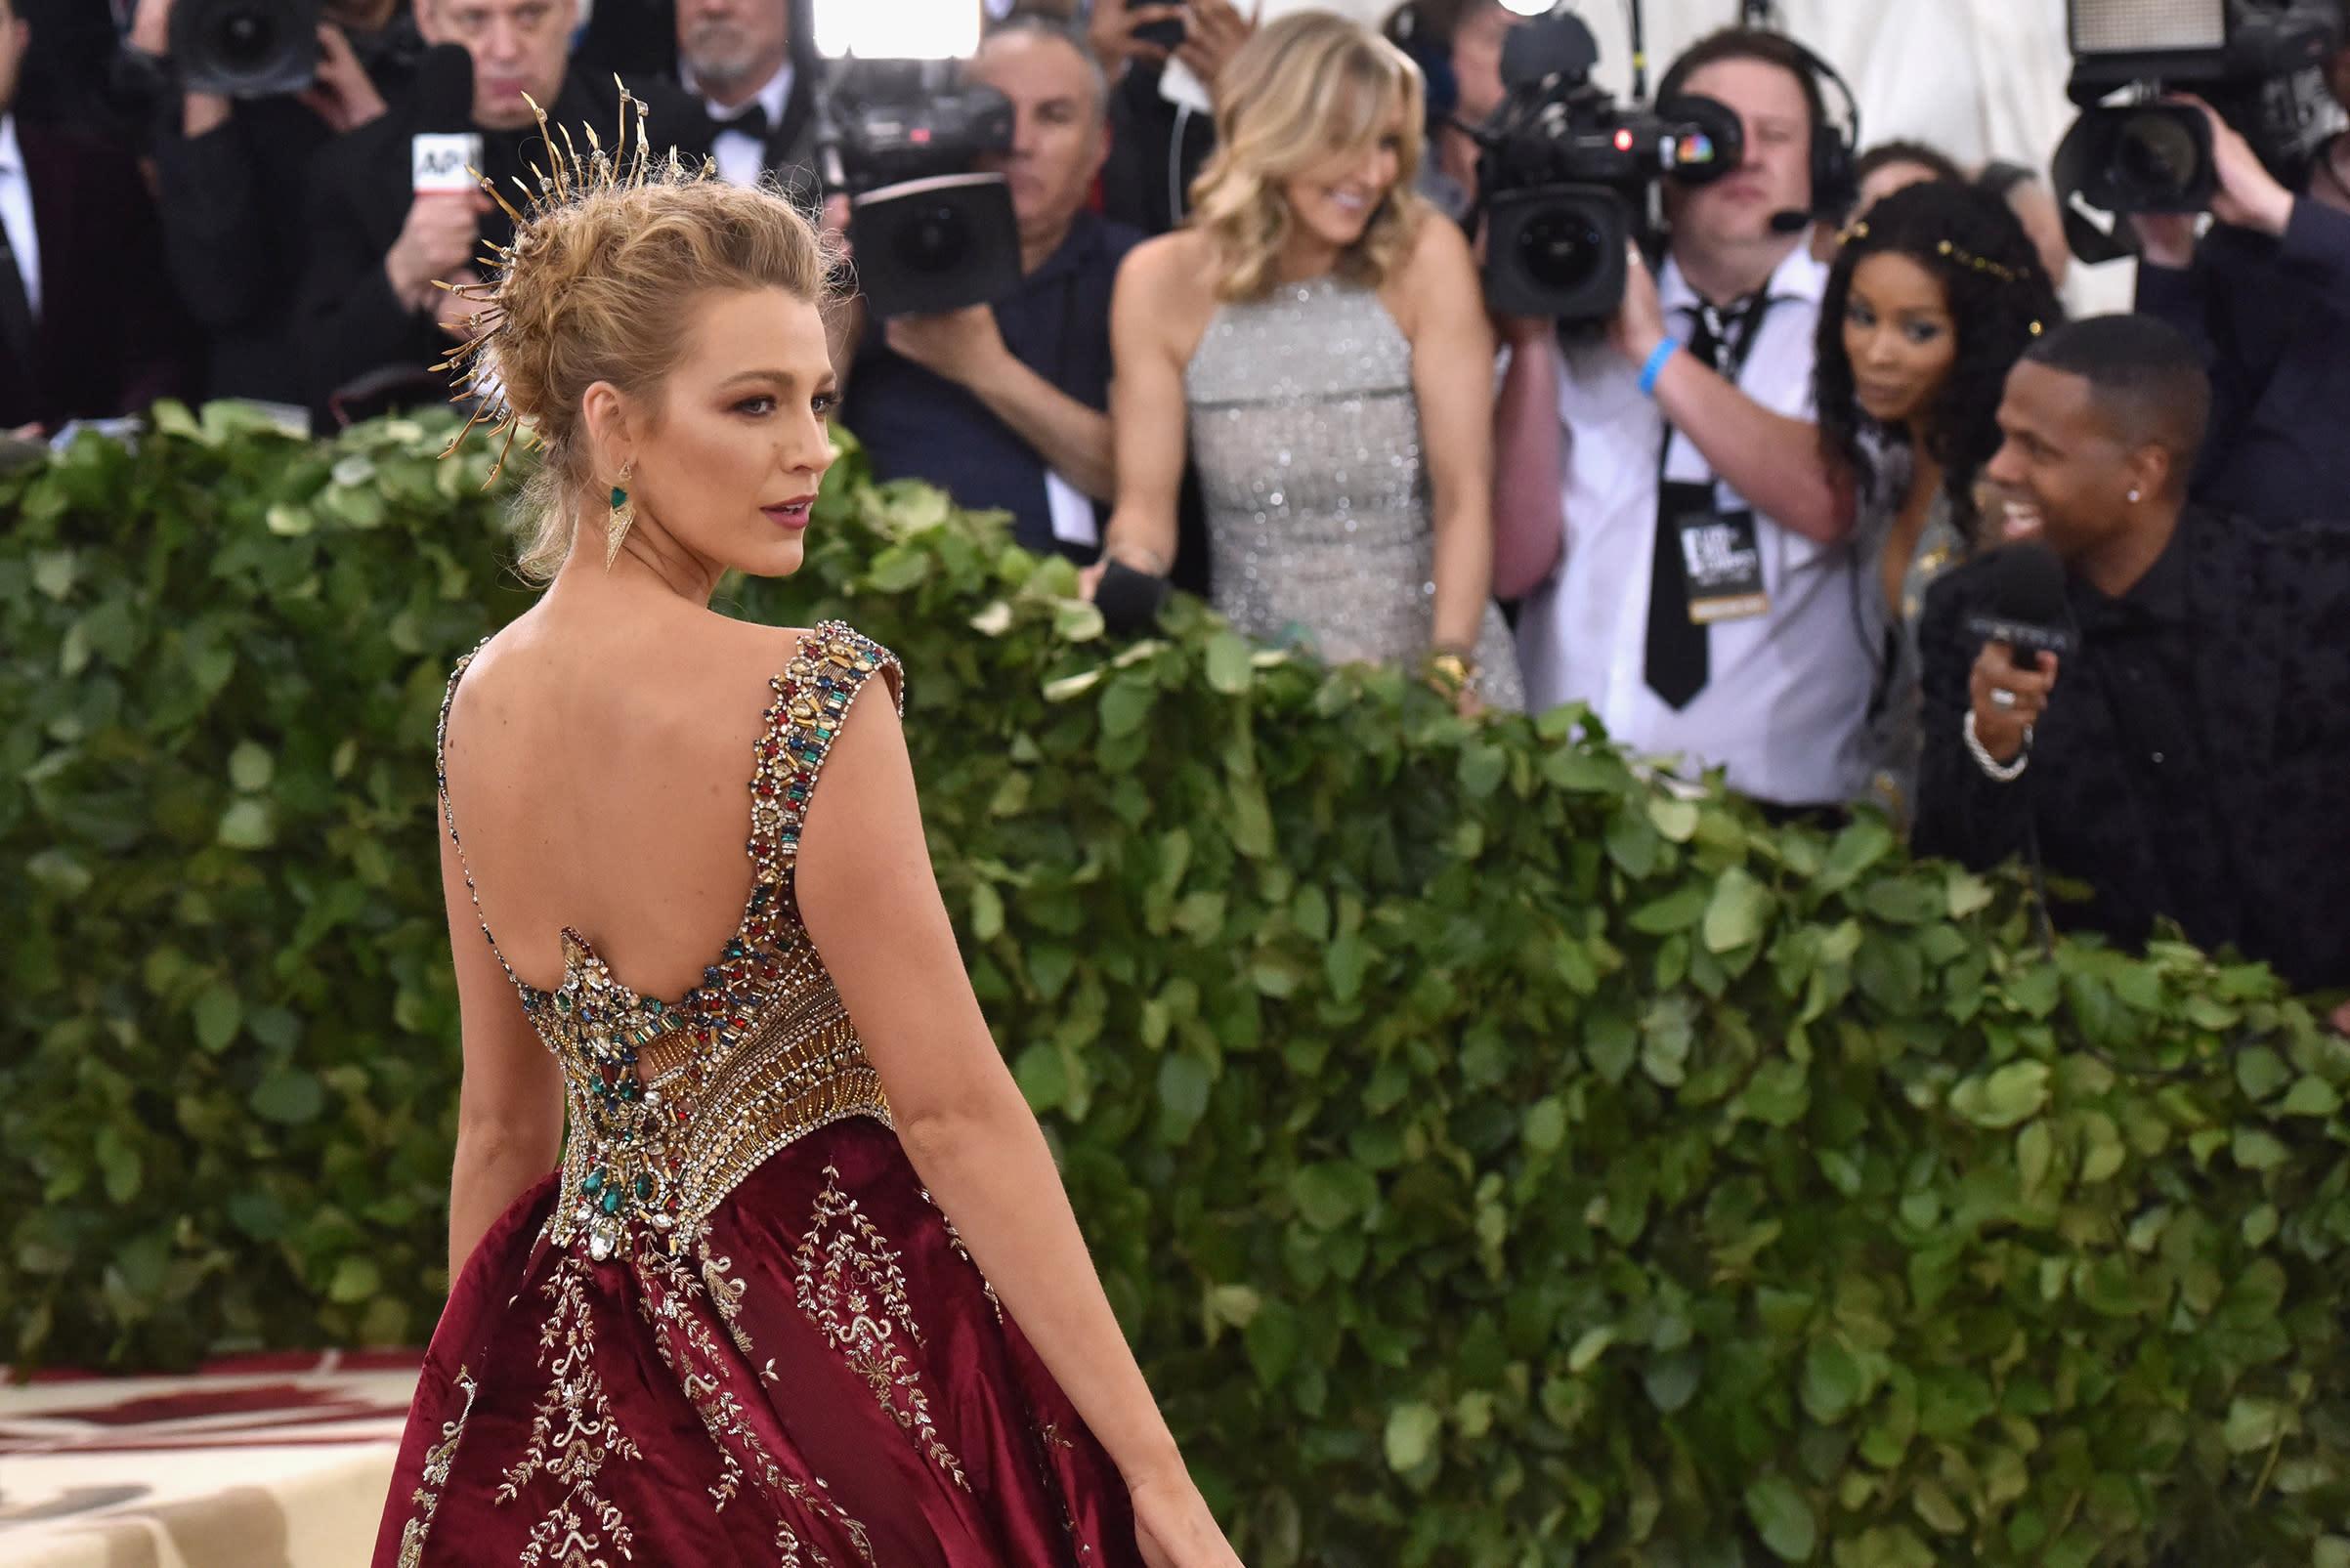 Blake Lively's Insane 2018 Met Gala Look Had $2 Million ...